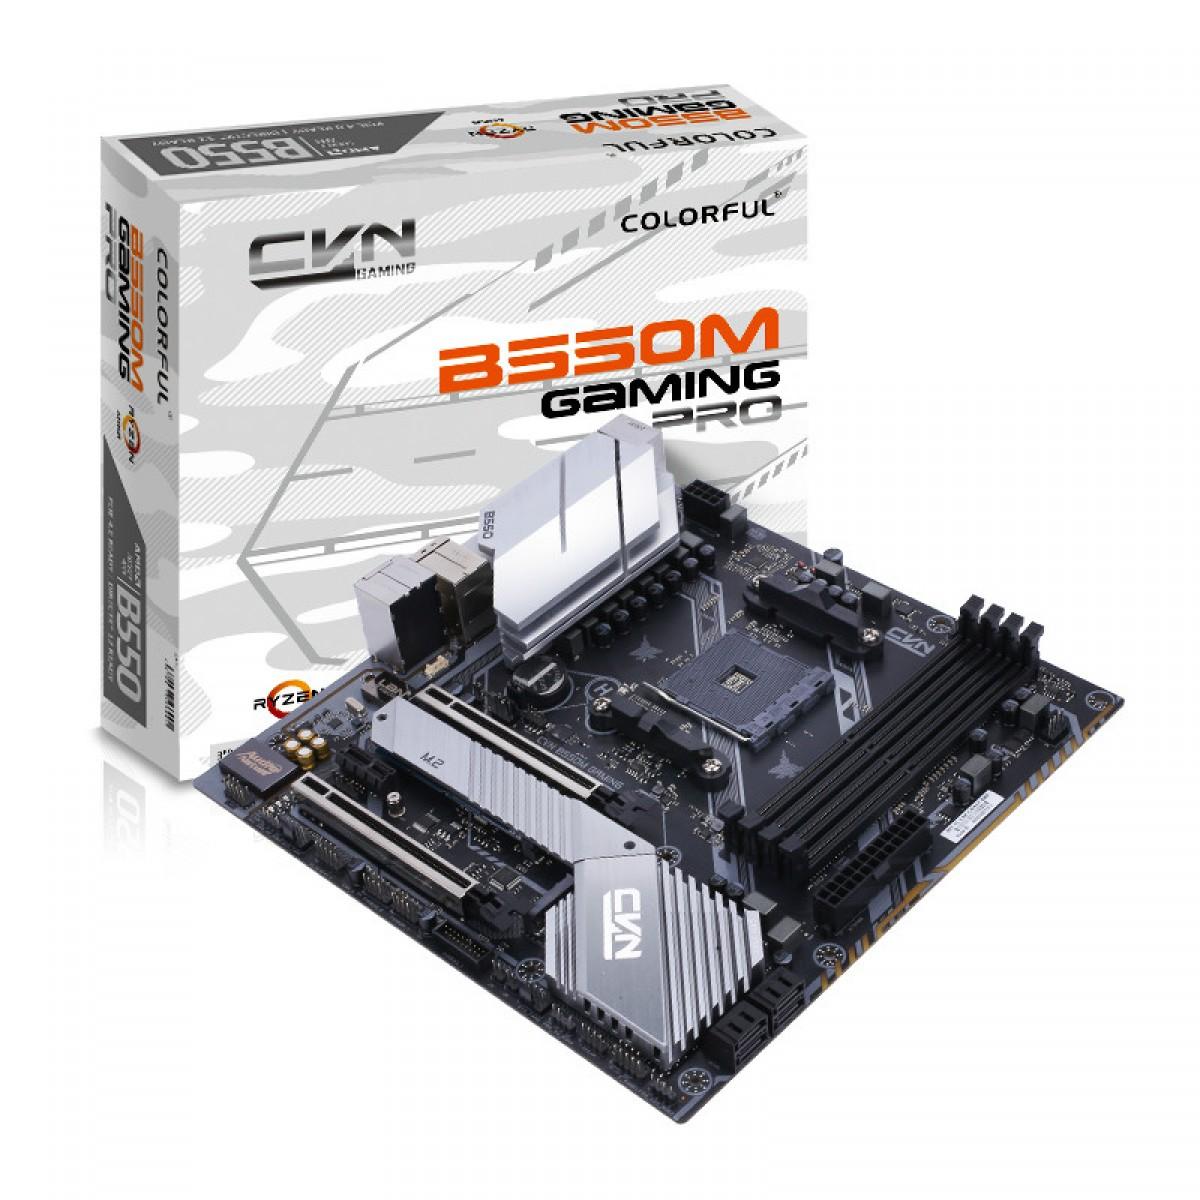 Placa Mãe Colorful CVN B550M GAMING PRO V14, Chipset B550, AMD AM4, mAXT, DDR4